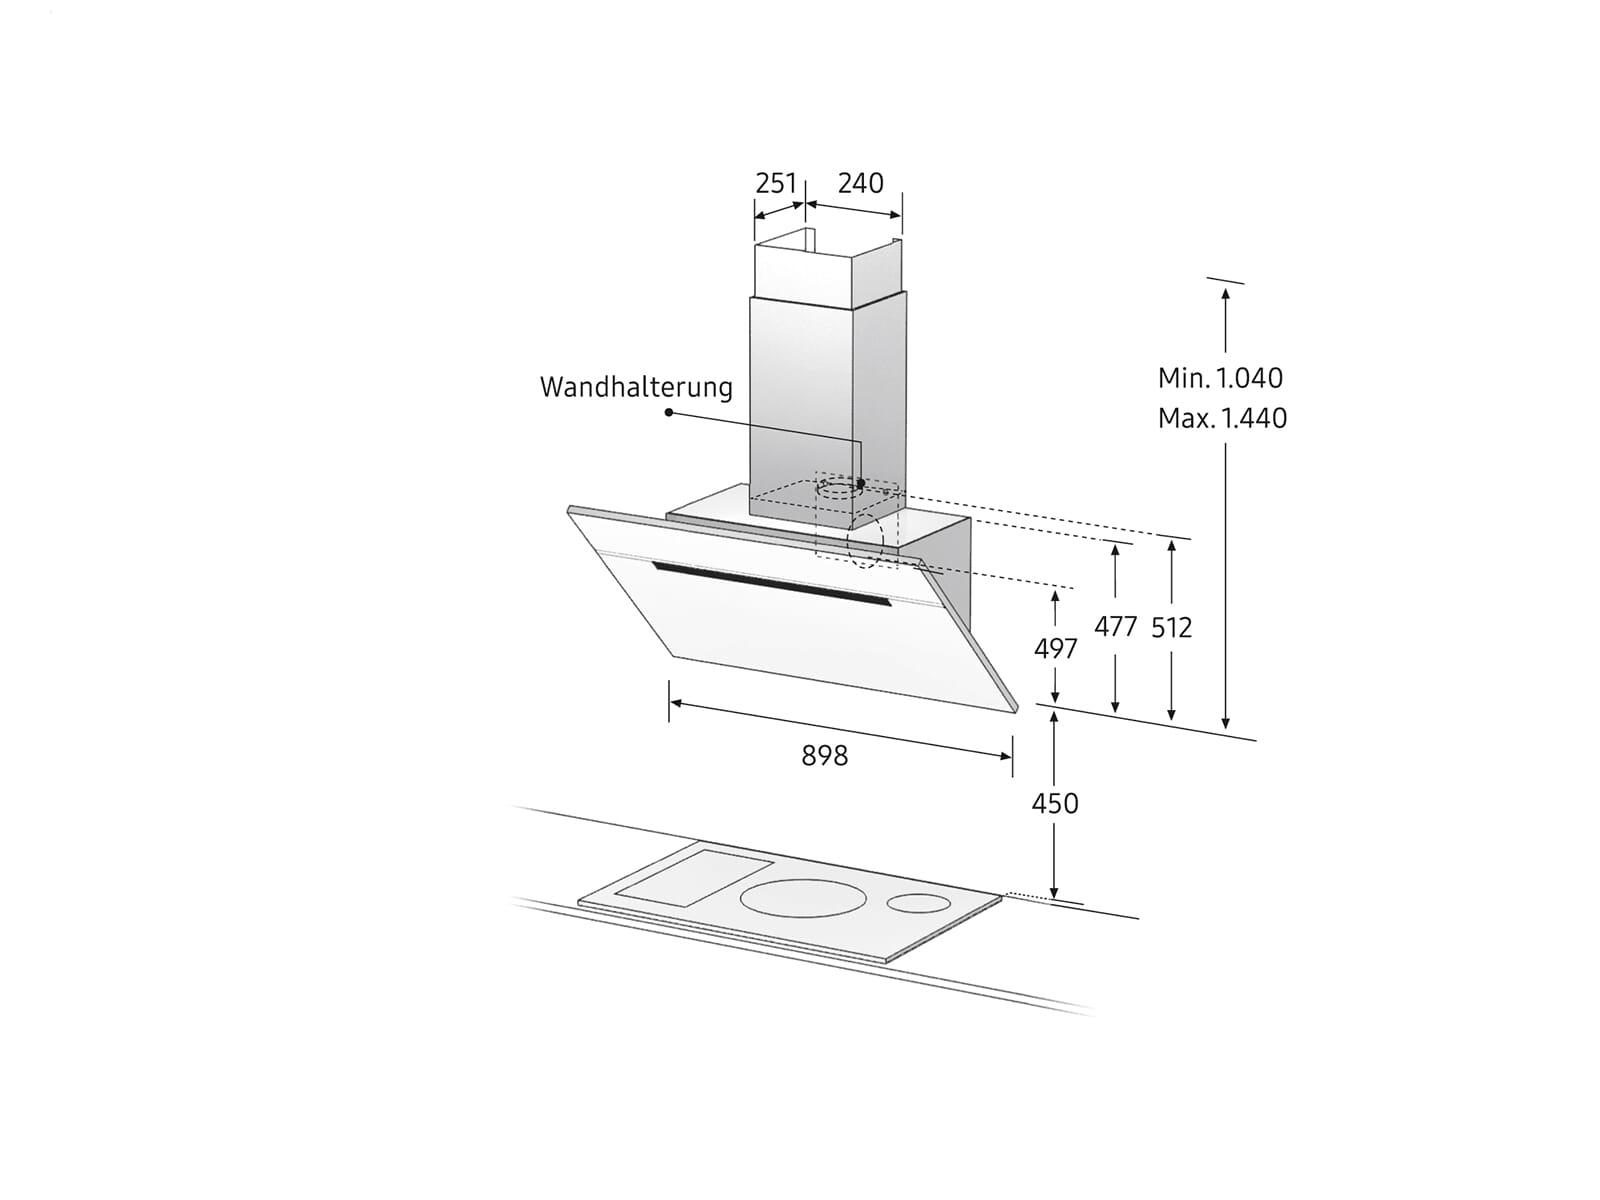 Samsung NK36M7070VB/UR Kopffreihaube 90 cm Glas-Schwarz